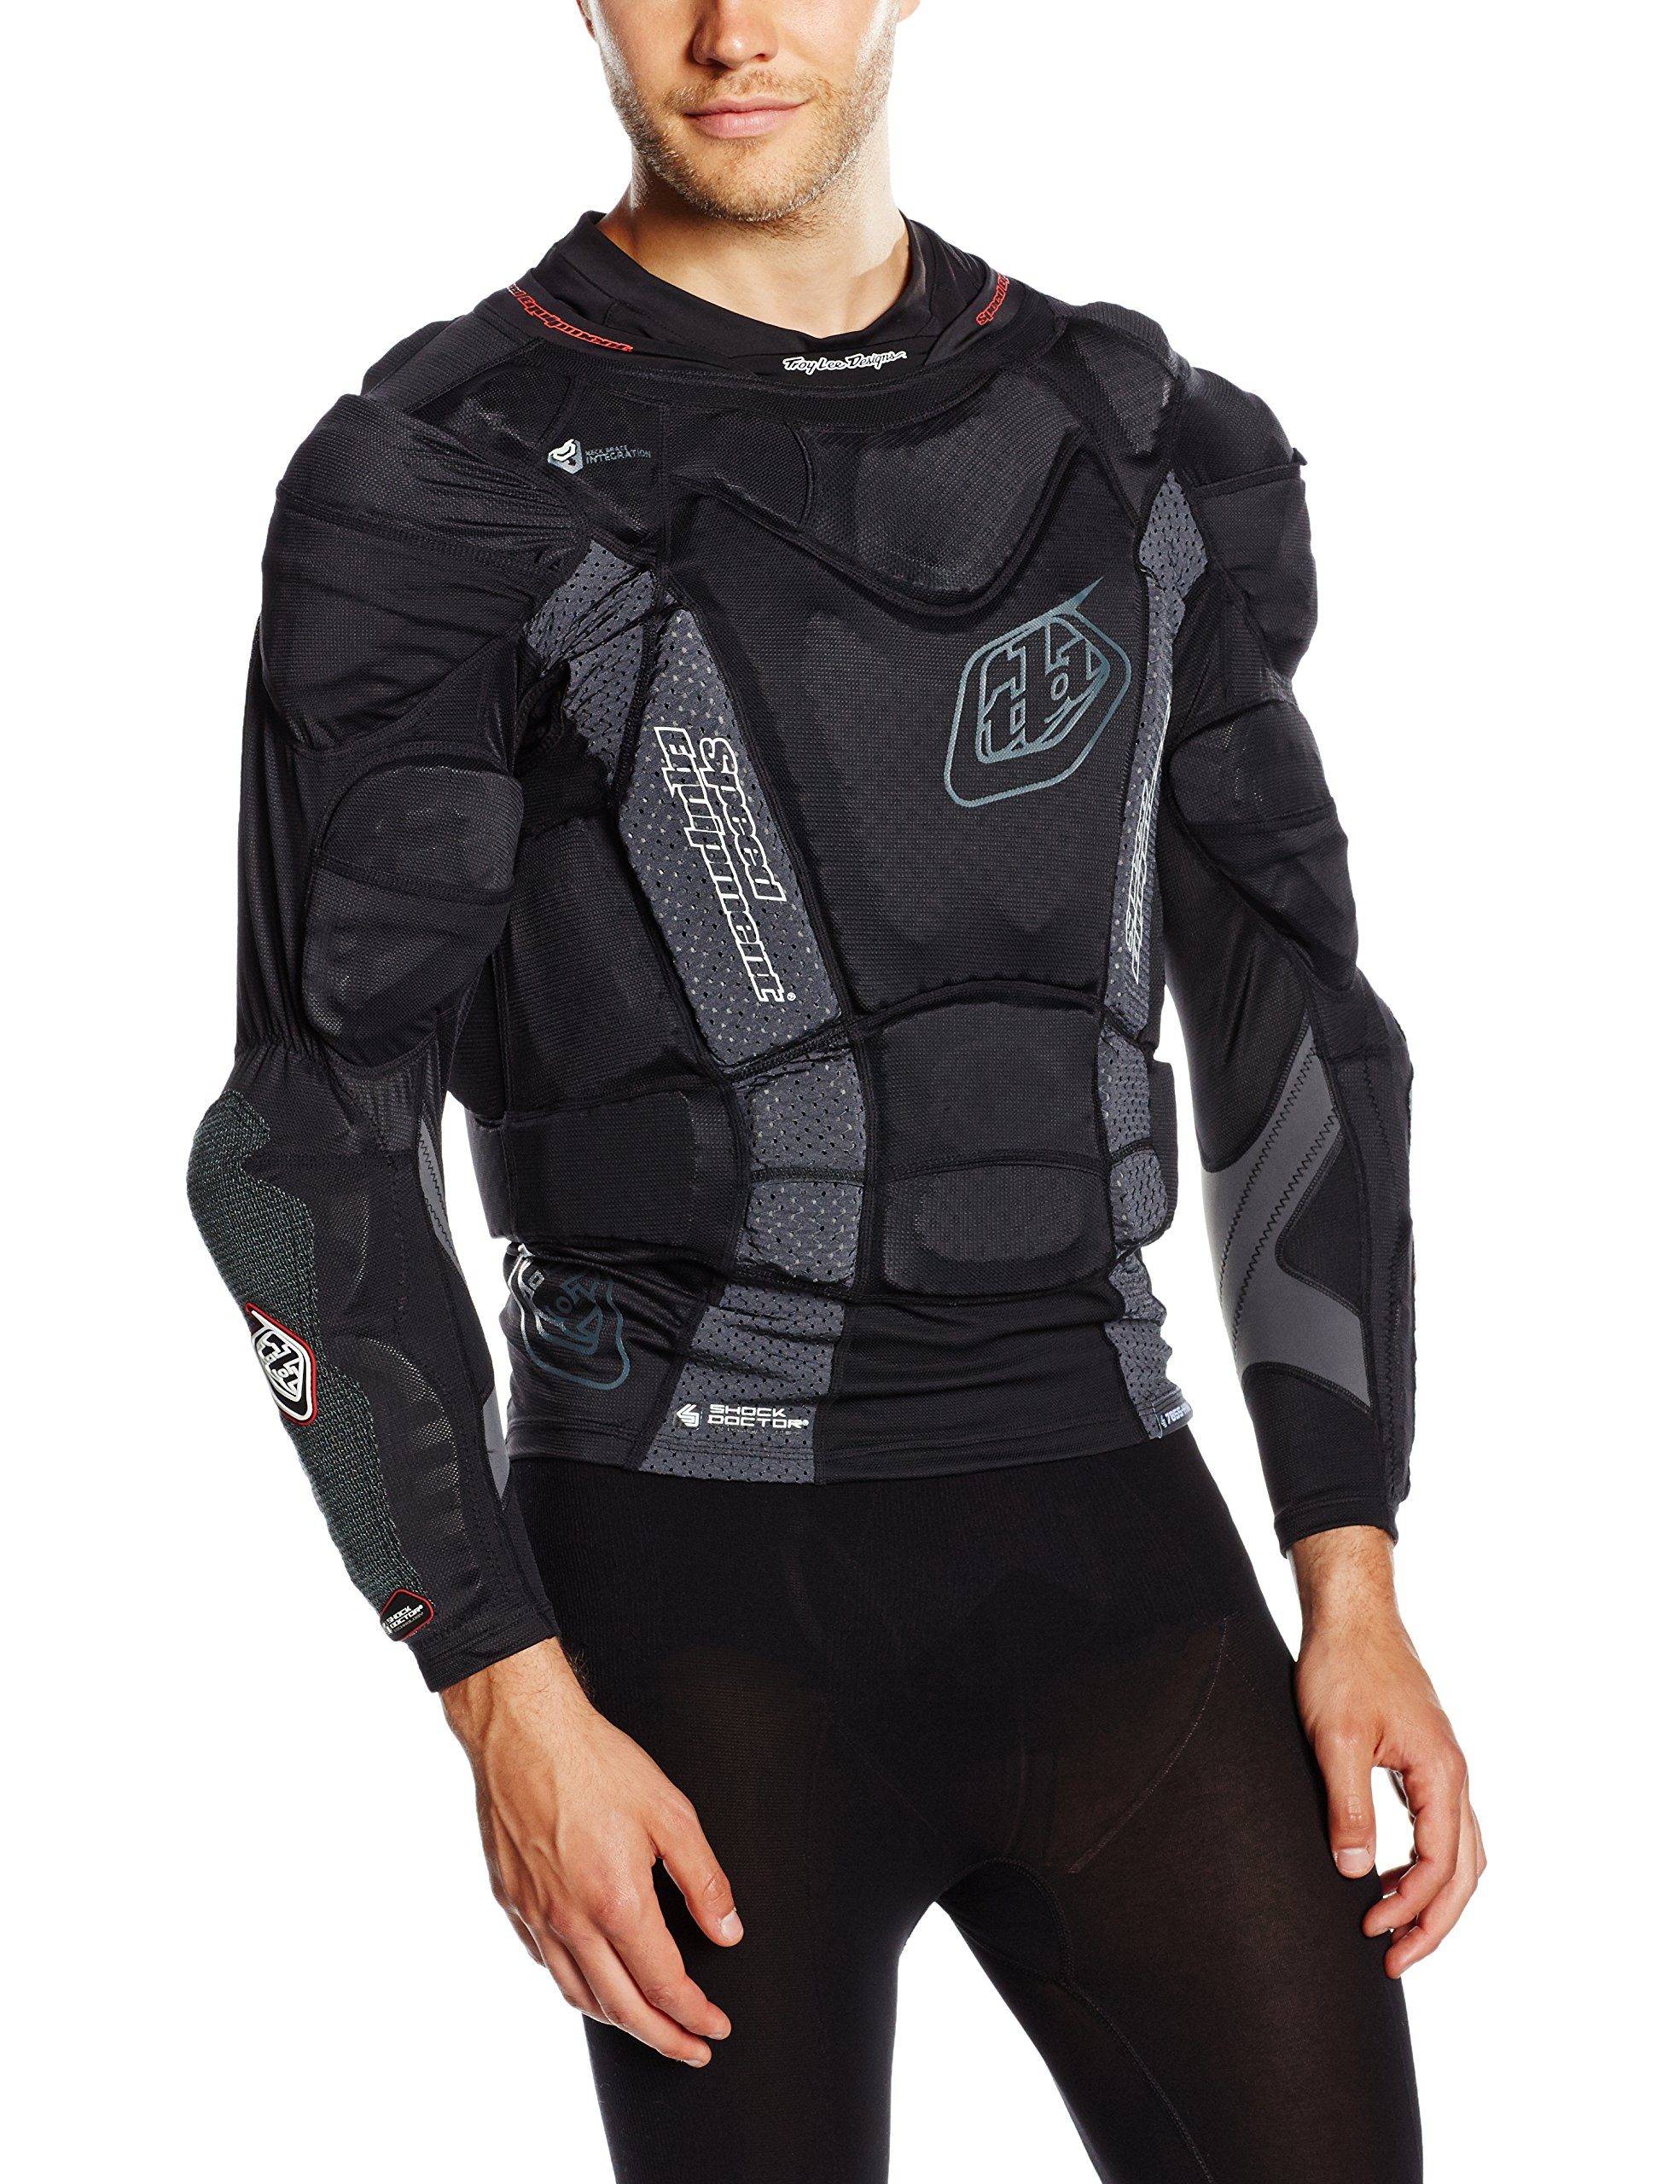 Troy Lee Designs UPL7855 HW Long Sleeve Boys Undergarment Off-Road Body Armor Black//Large